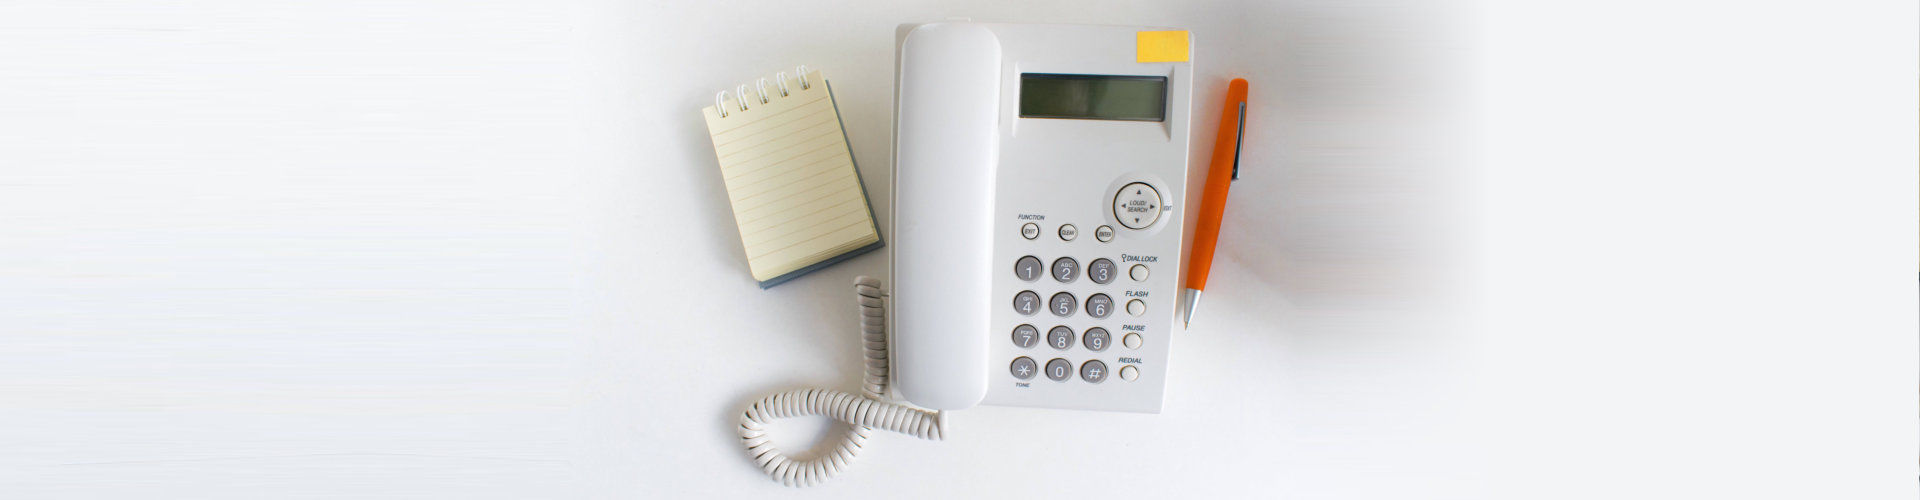 notepad, telephone, pen